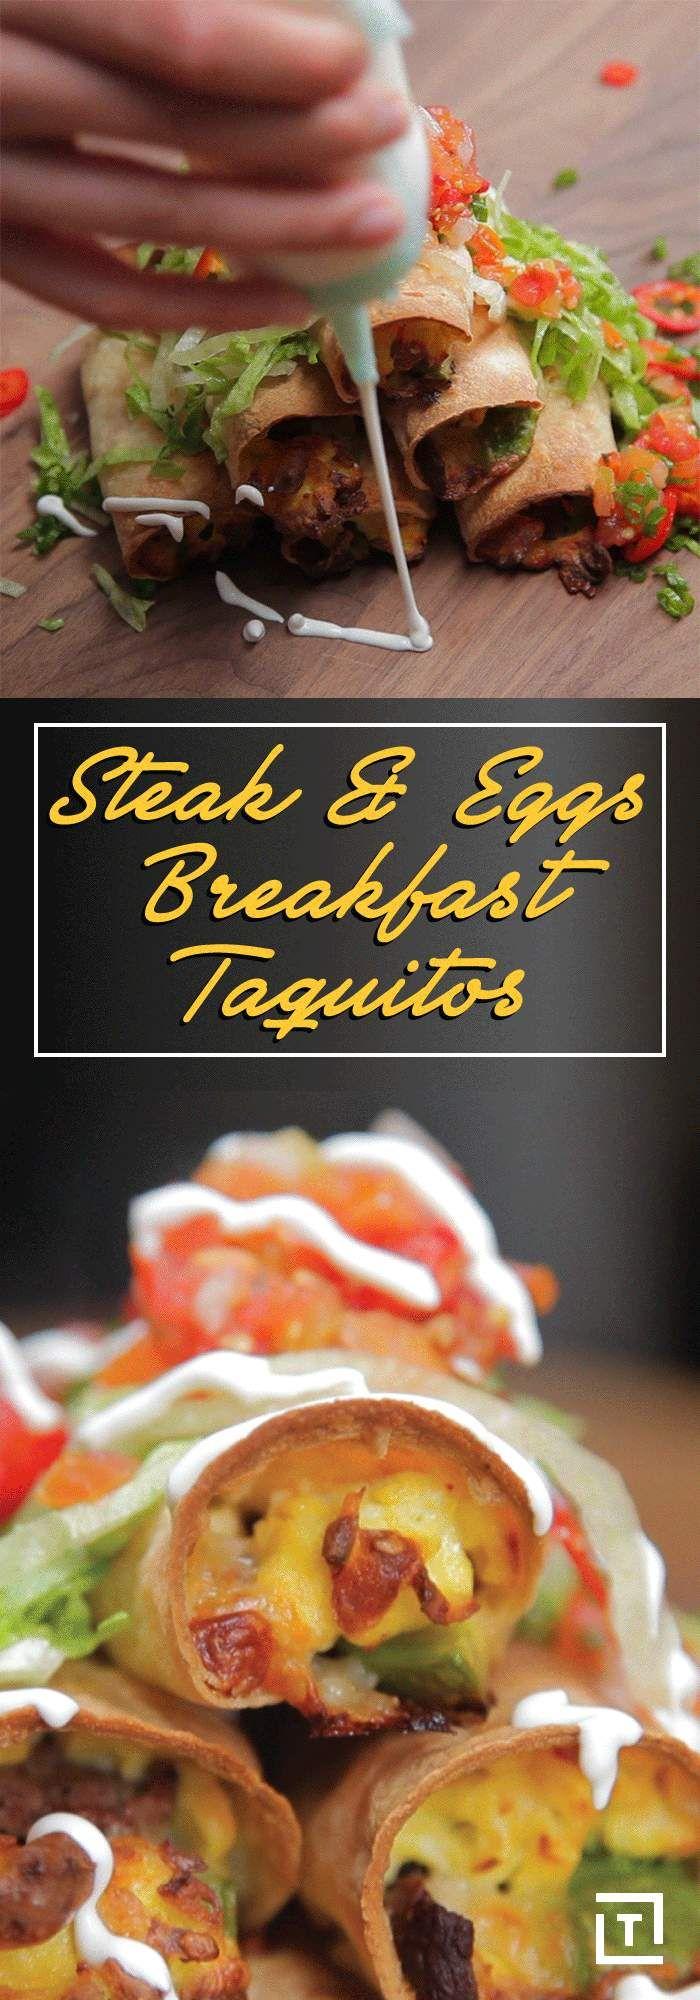 Wake Up to Steak & Eggs Breakfast Taquitos